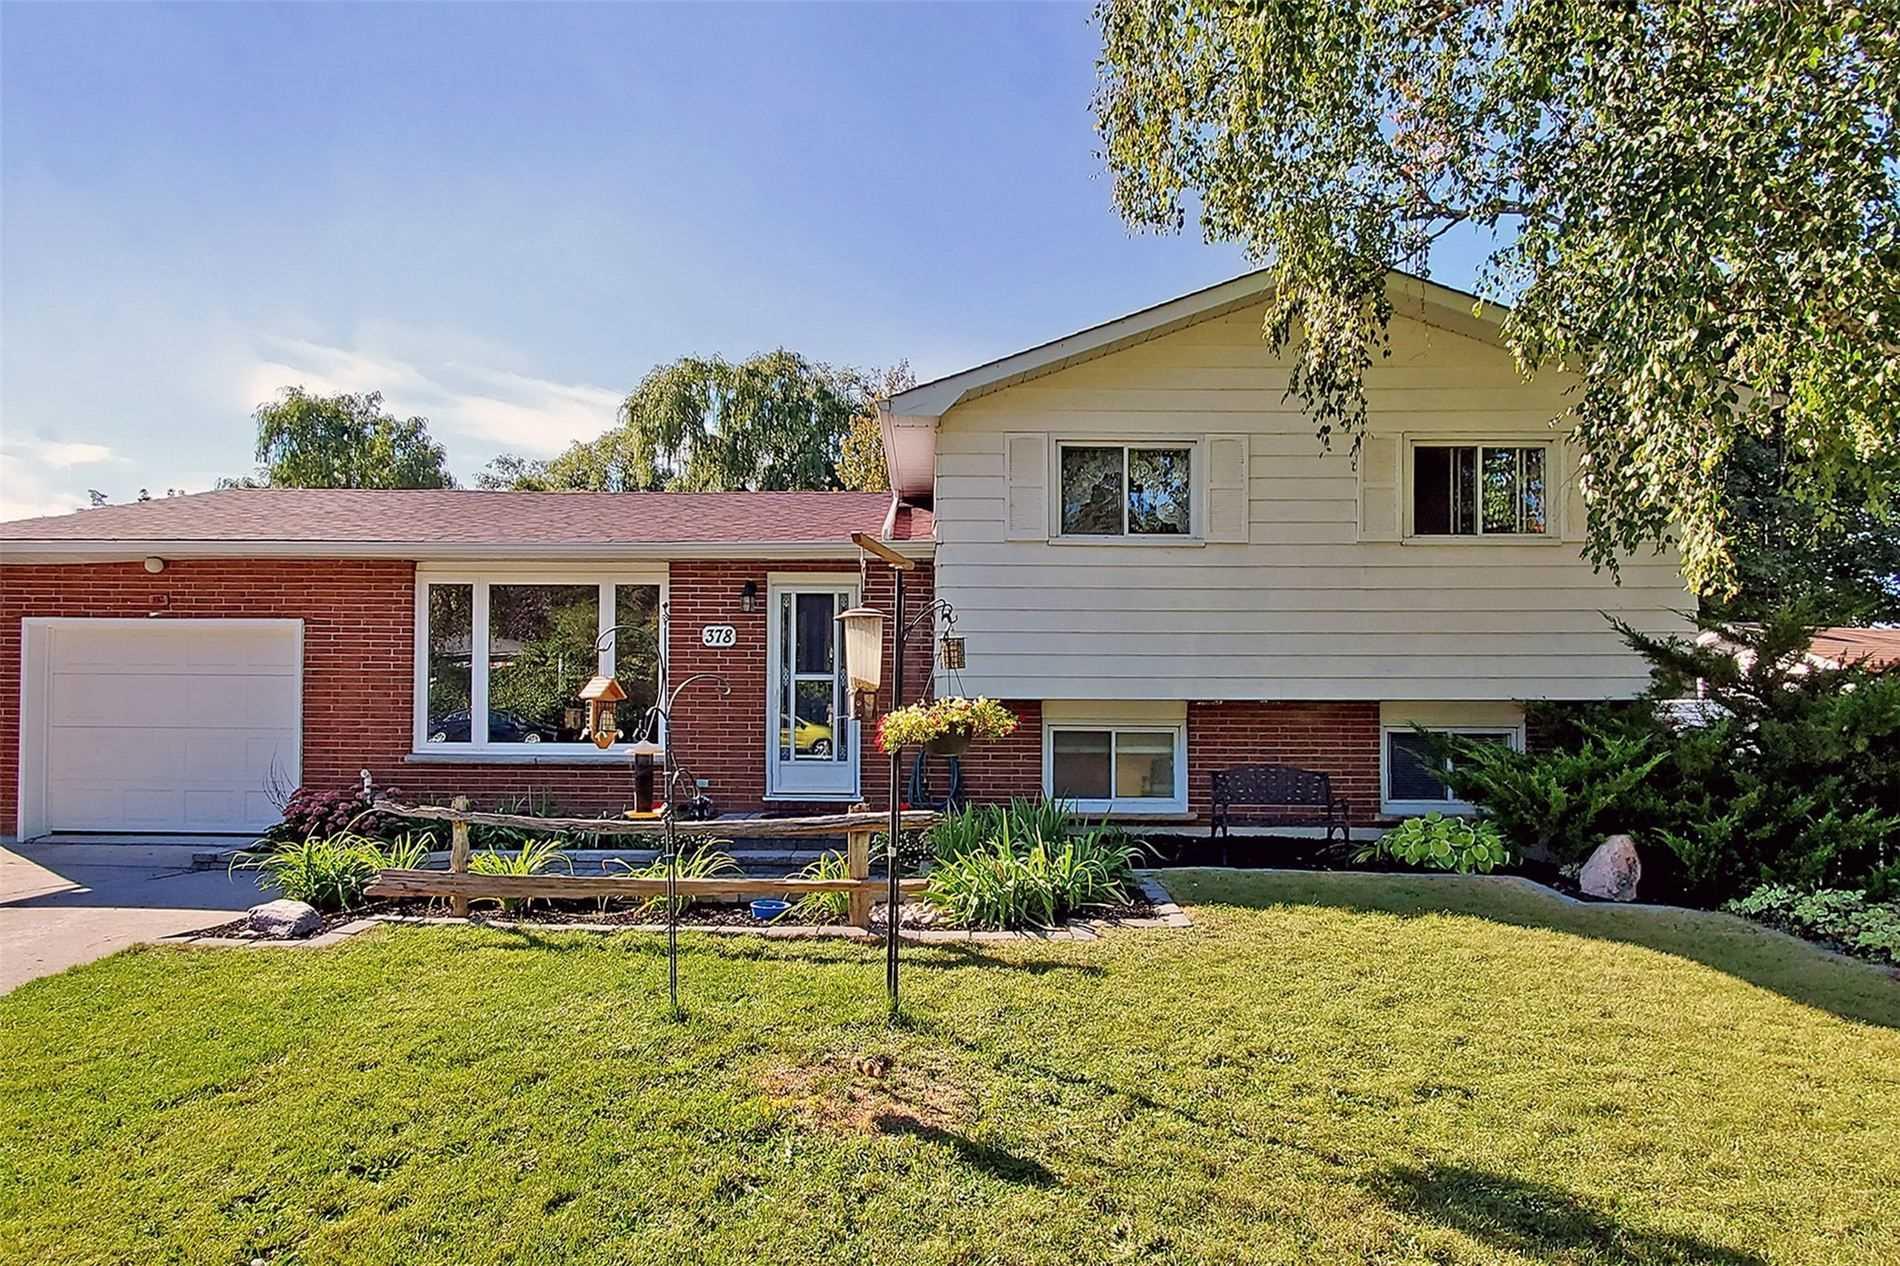 378 May St, Brock, Ontario L0K1A0, 3 Bedrooms Bedrooms, ,2 BathroomsBathrooms,Detached,For Sale,May,N5368489